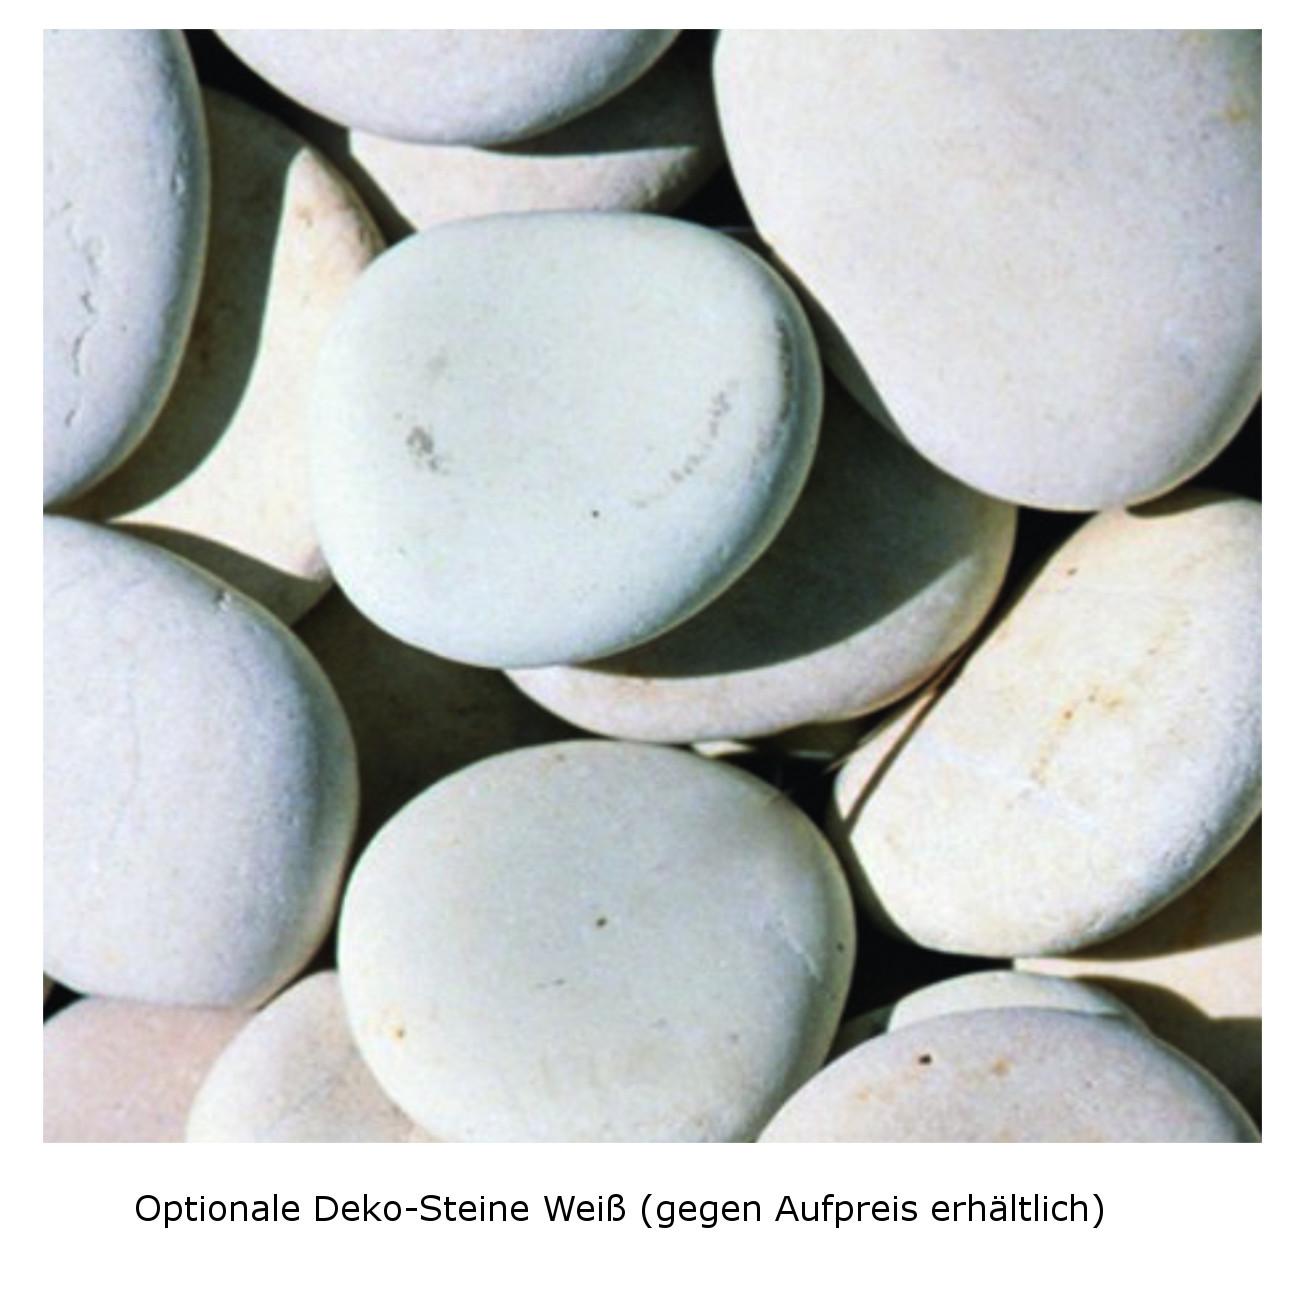 deko-steine-weiss-glammfirezOuArpUQYN2tD